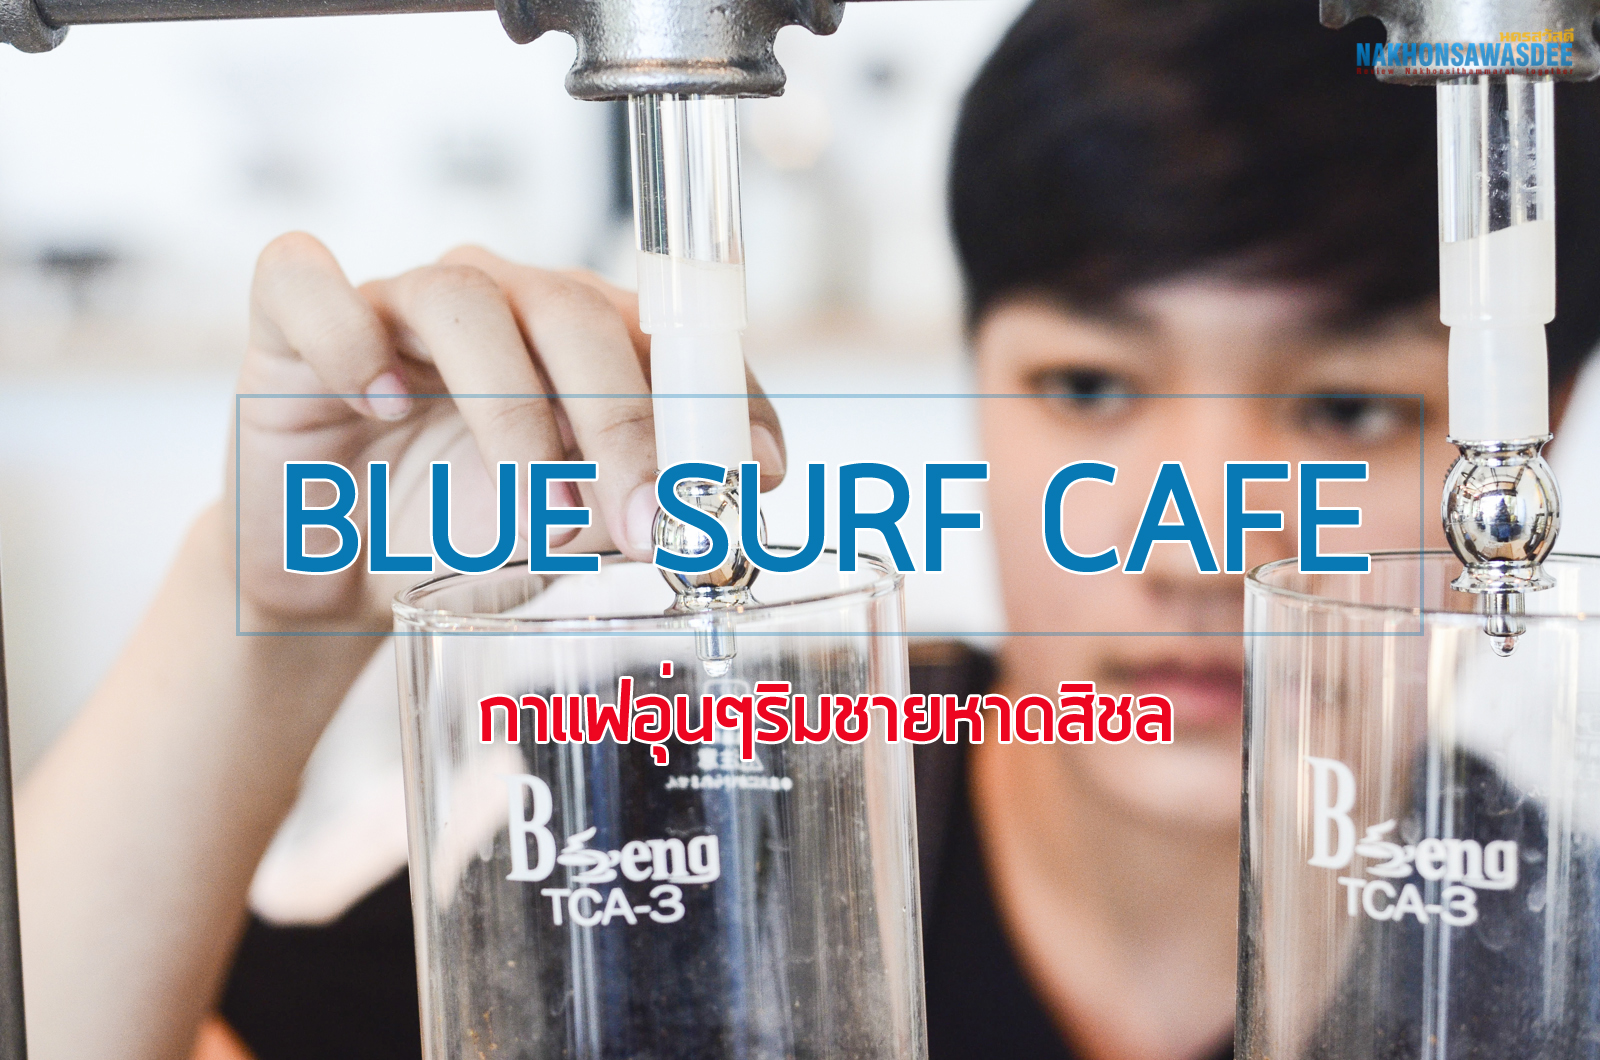 Blue surf cafe สิชลคาบาน่า นครศรีธรรมราช